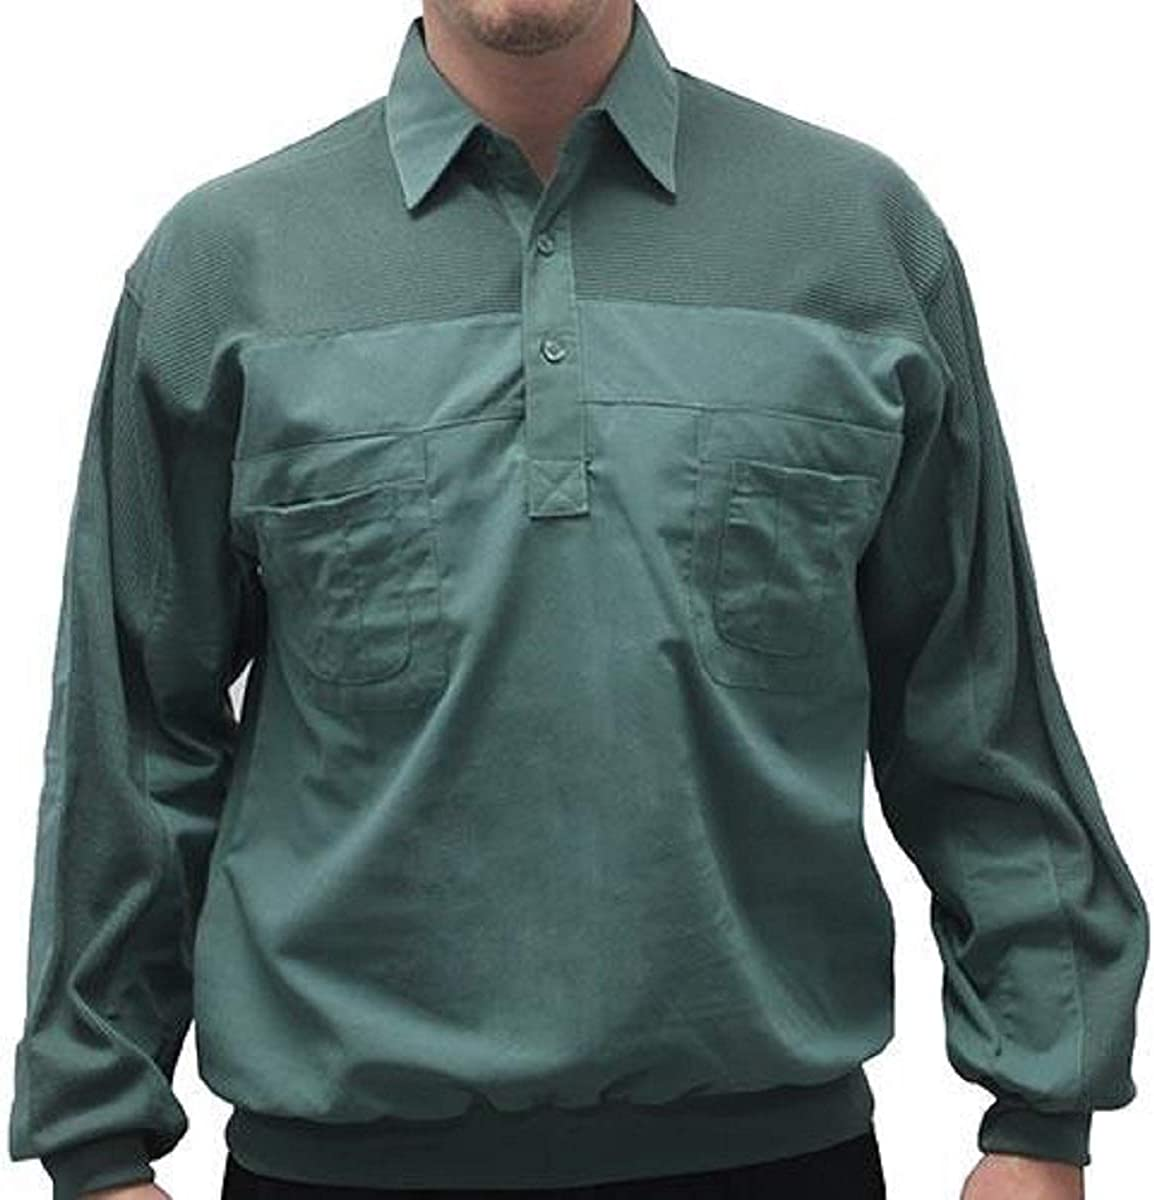 LD Sport 4 Pocket Long Sleeve Banded Bottom Shirt - 6097-200BT